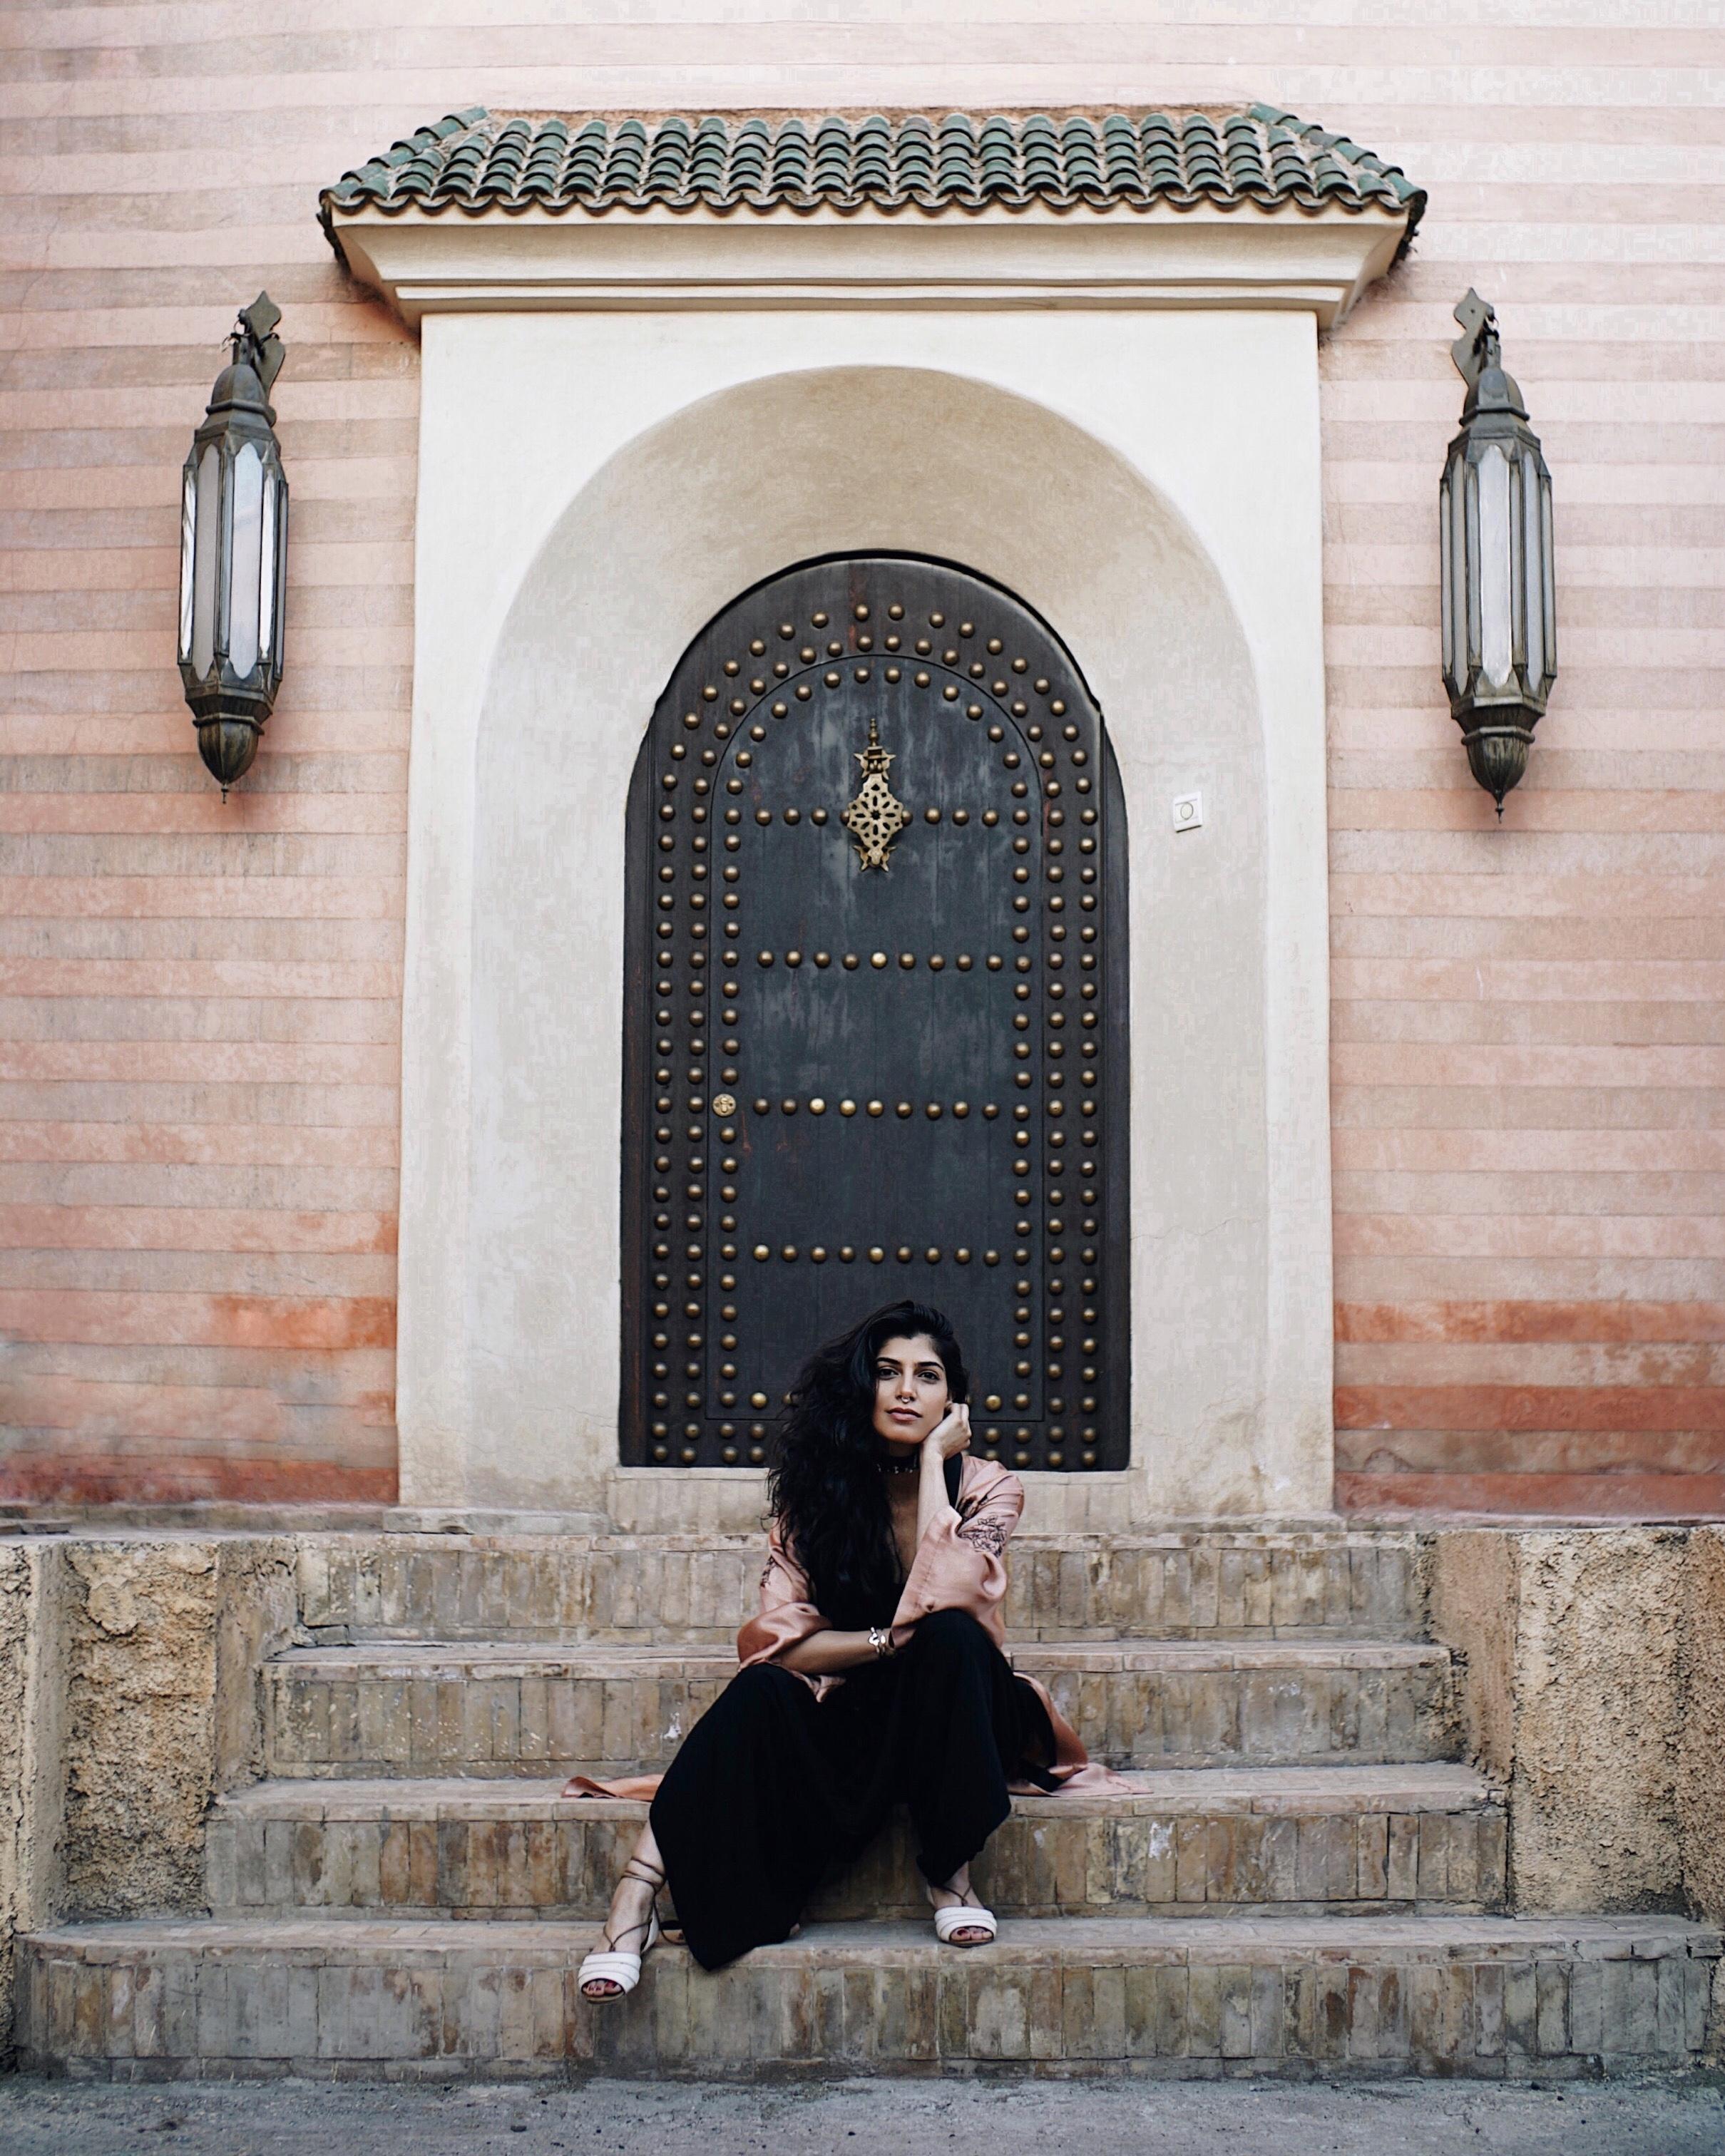 Marrakech Museum, Morocco. Photo taken by Kim Geronimo (@thestreetsensei)